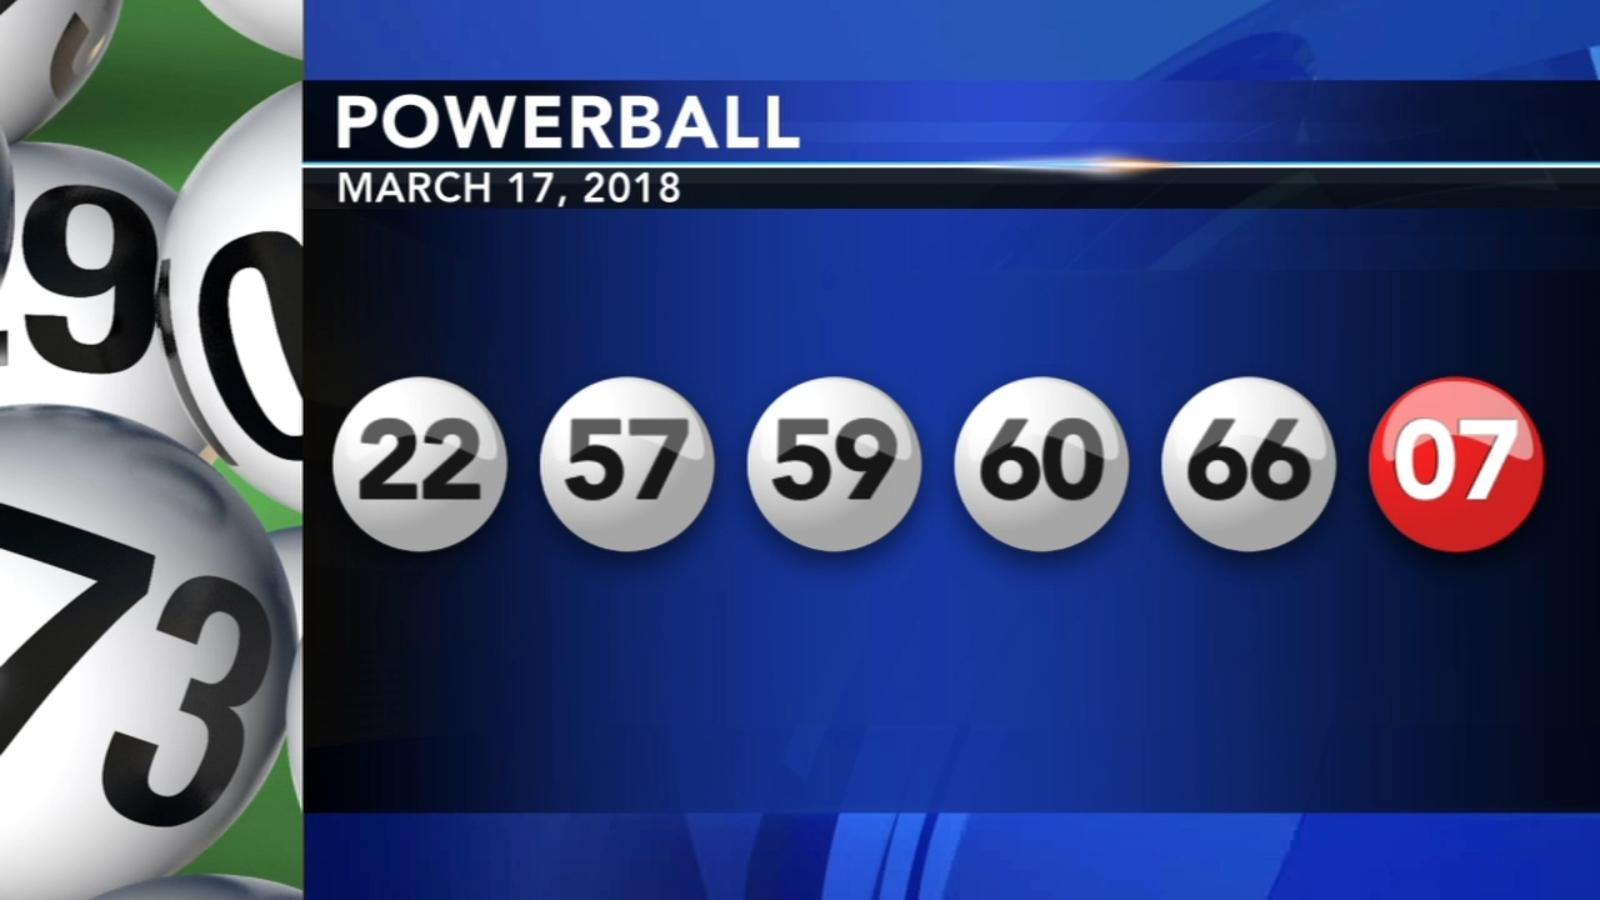 456m Powerball Ticket Sold In Pennsylvania Abc7 Com